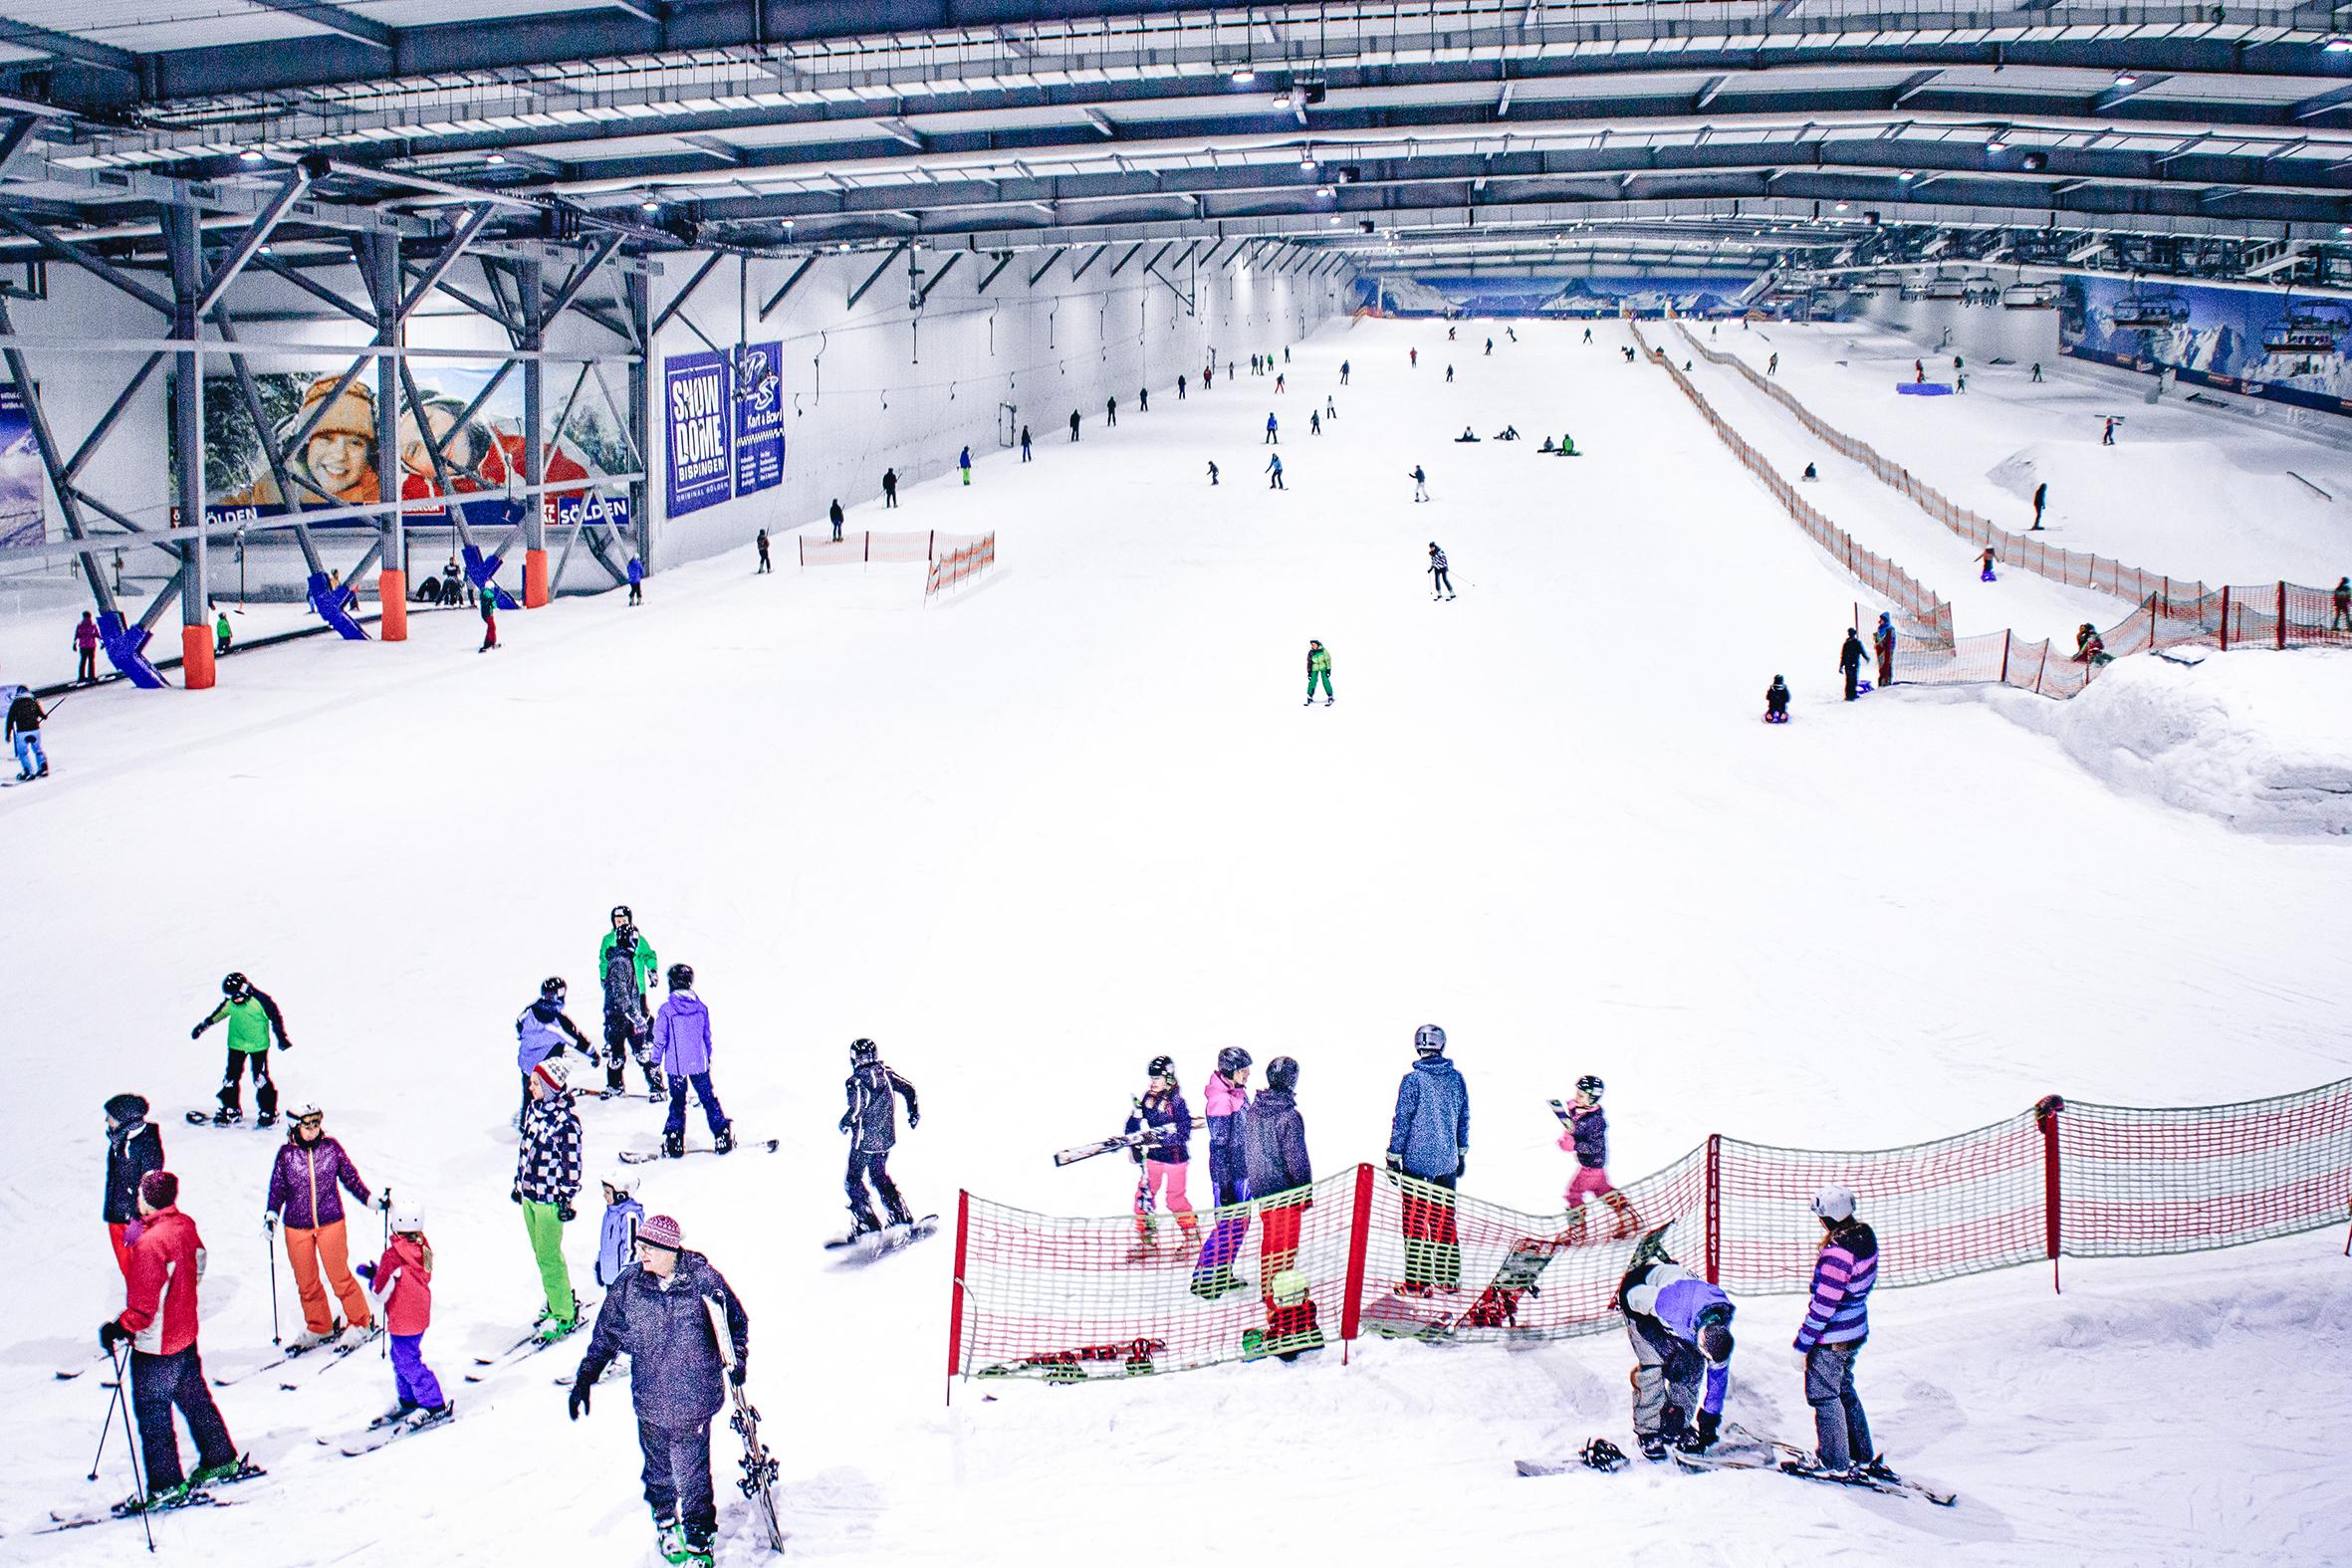 abenteuer-resort-snow-dome